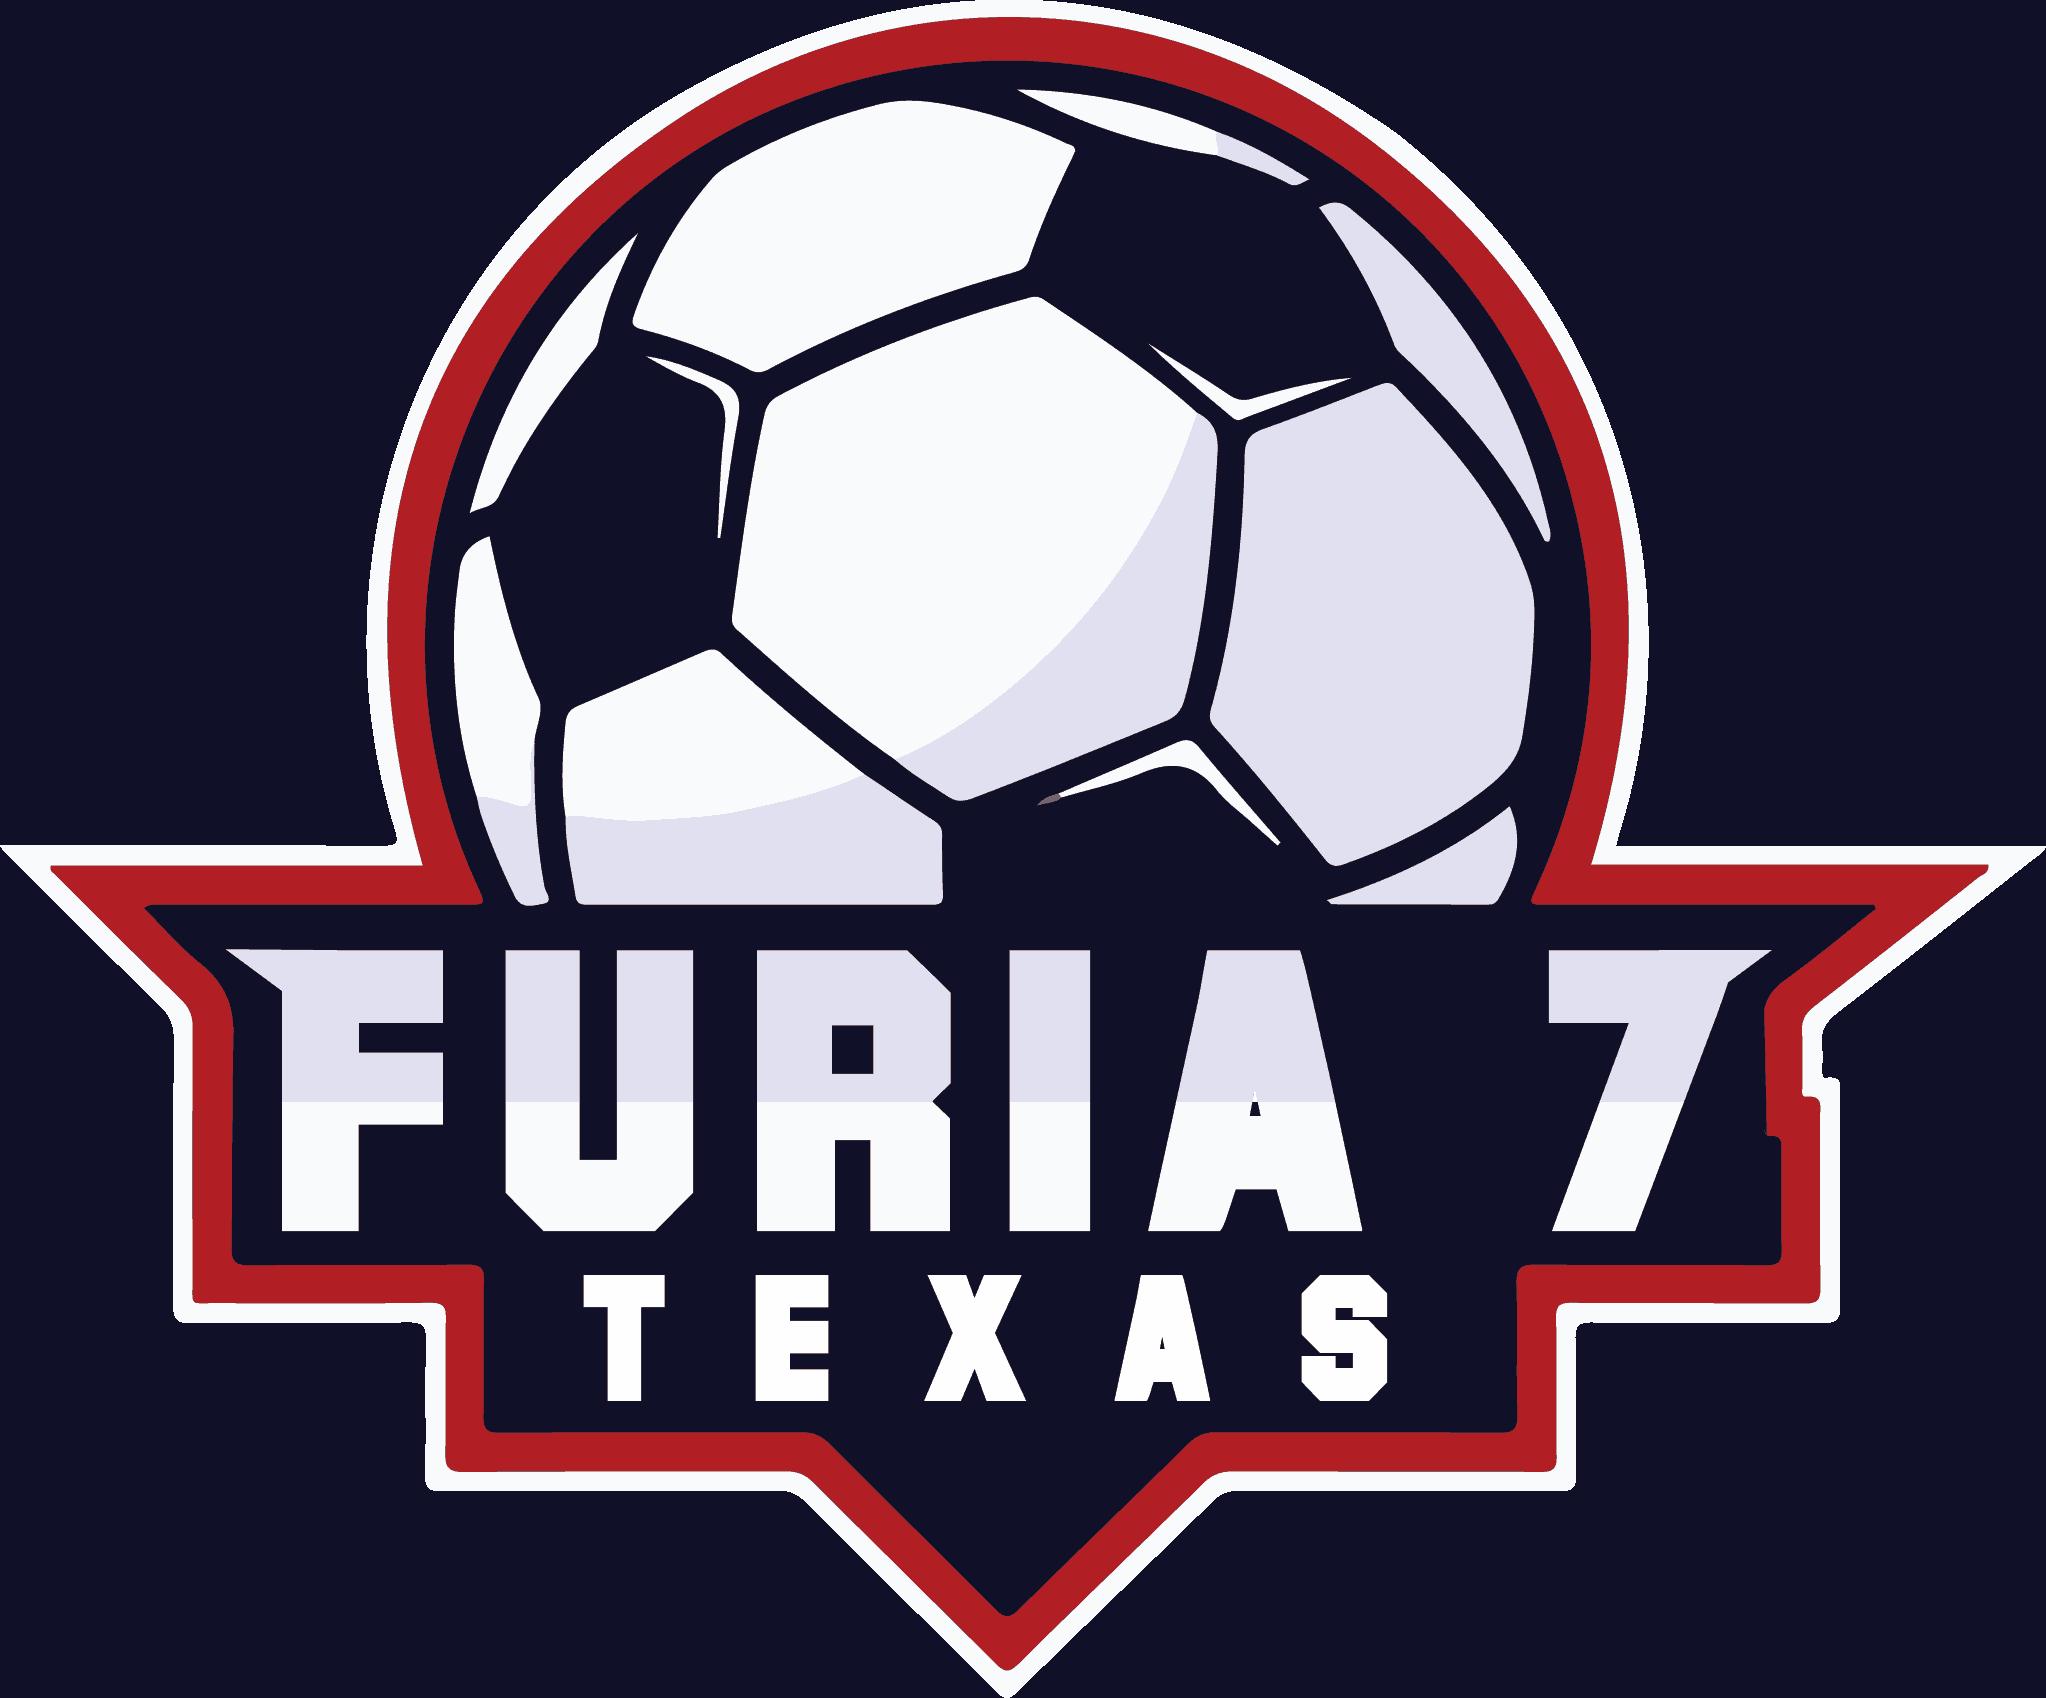 Furia 7 Texas